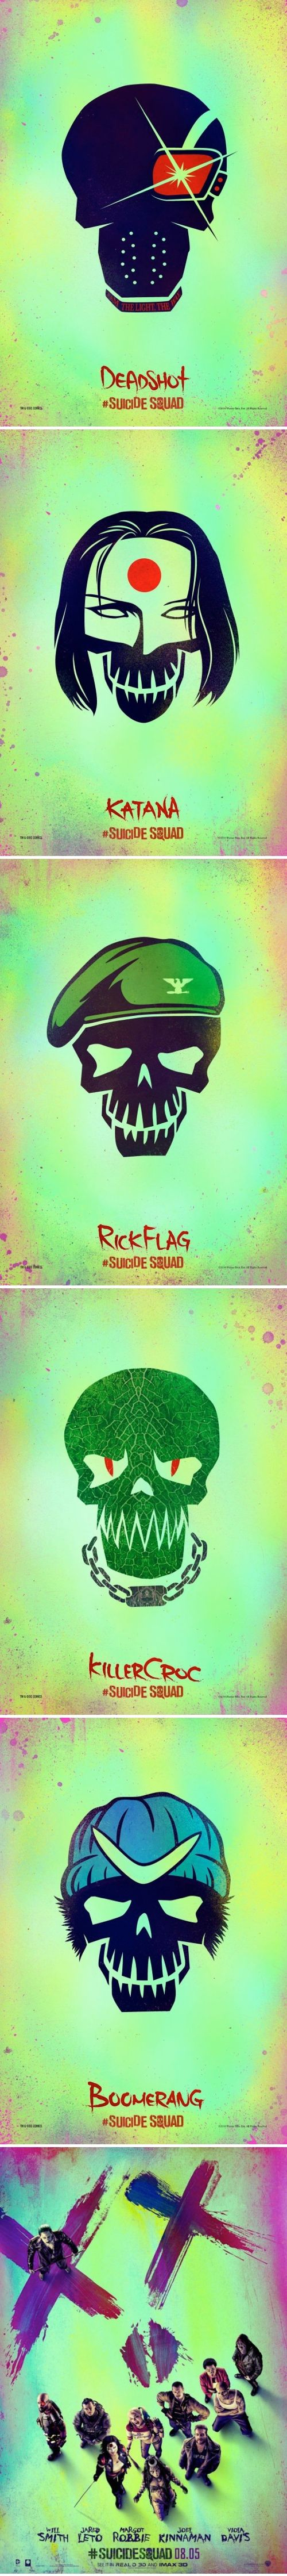 Suicide Squad Character Posters - Deadshot, Katana, Rick Flag, Killer Croc & Boomerang